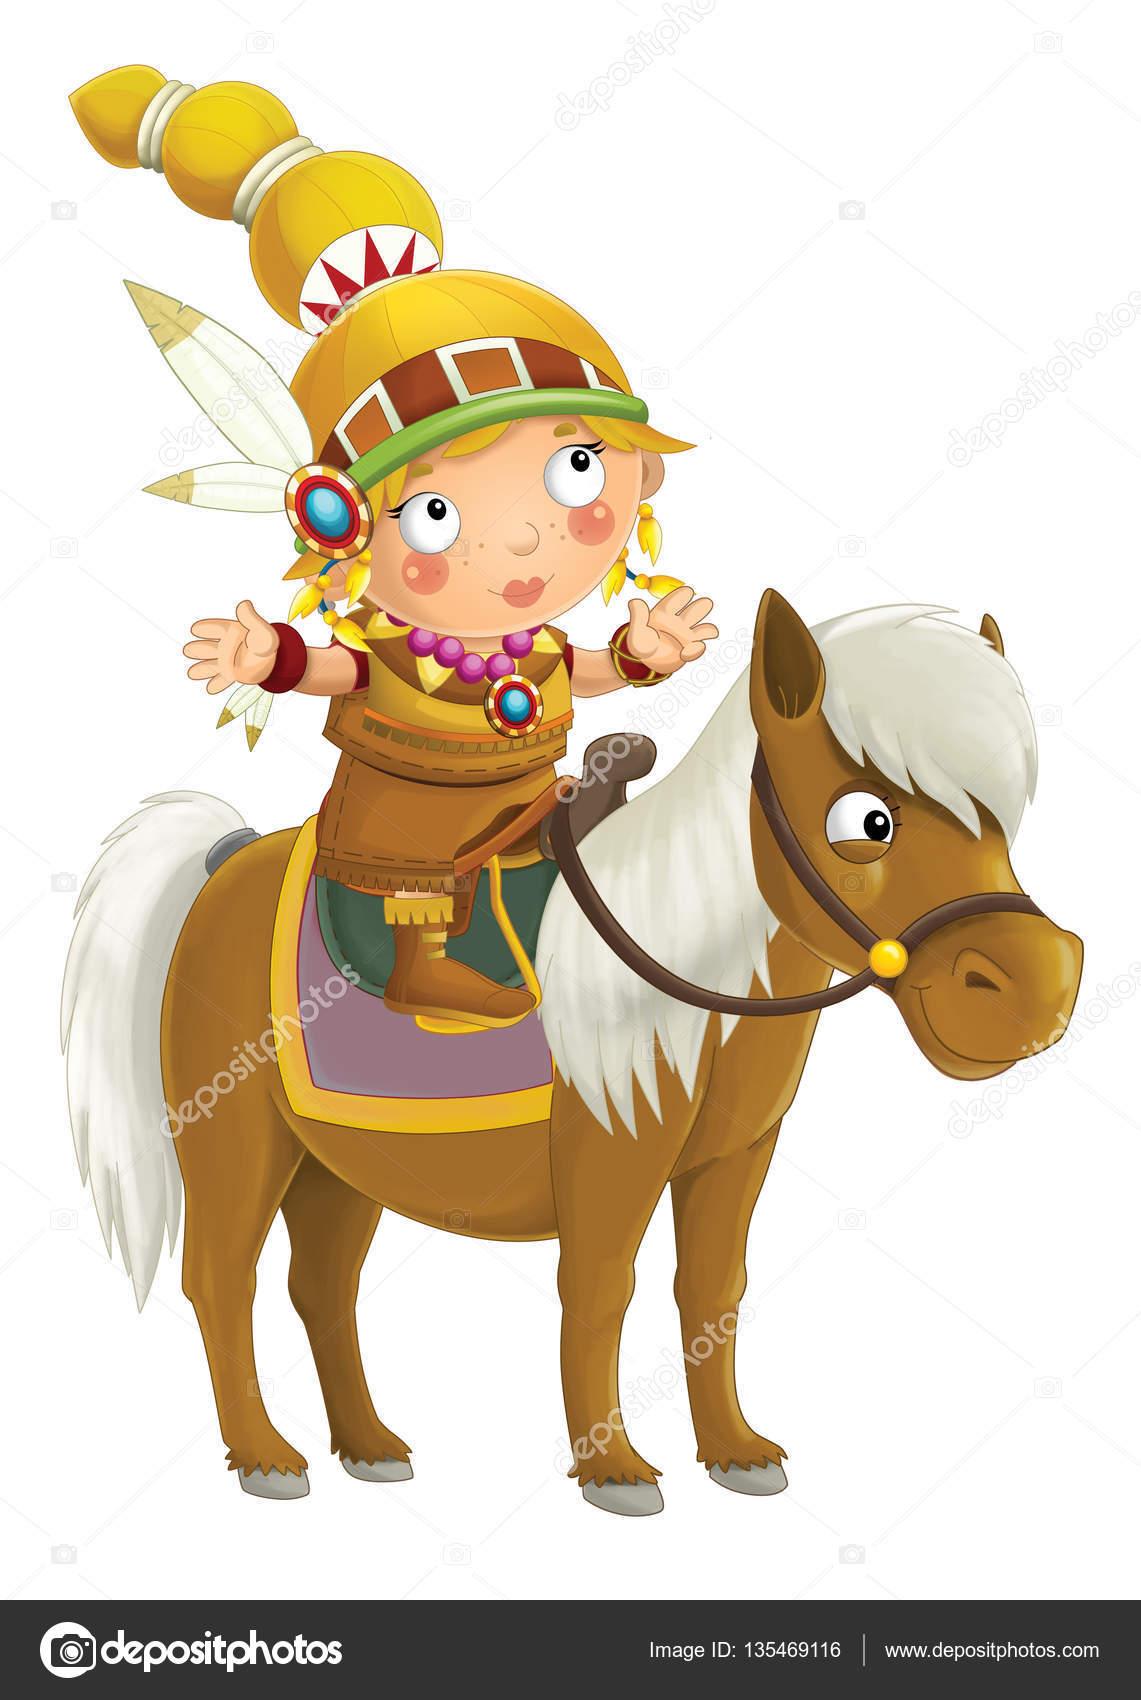 Indian kobieta kresk wka na koniu zdj cie stockowe illustrator hft 135469116 - Dessin anime indien cheval ...